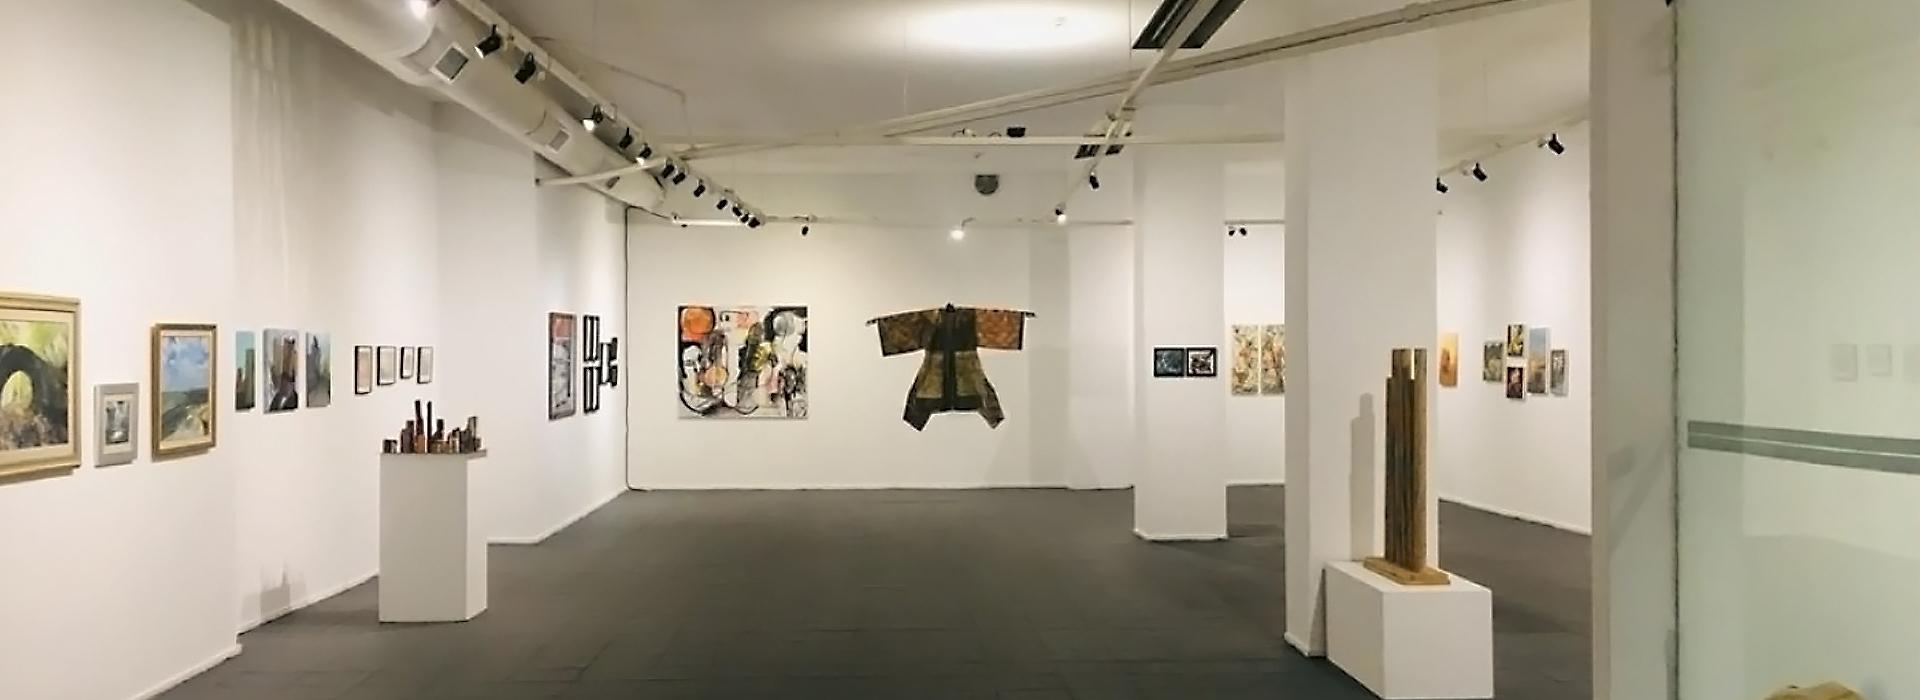 Slide Centro Cultural Borges